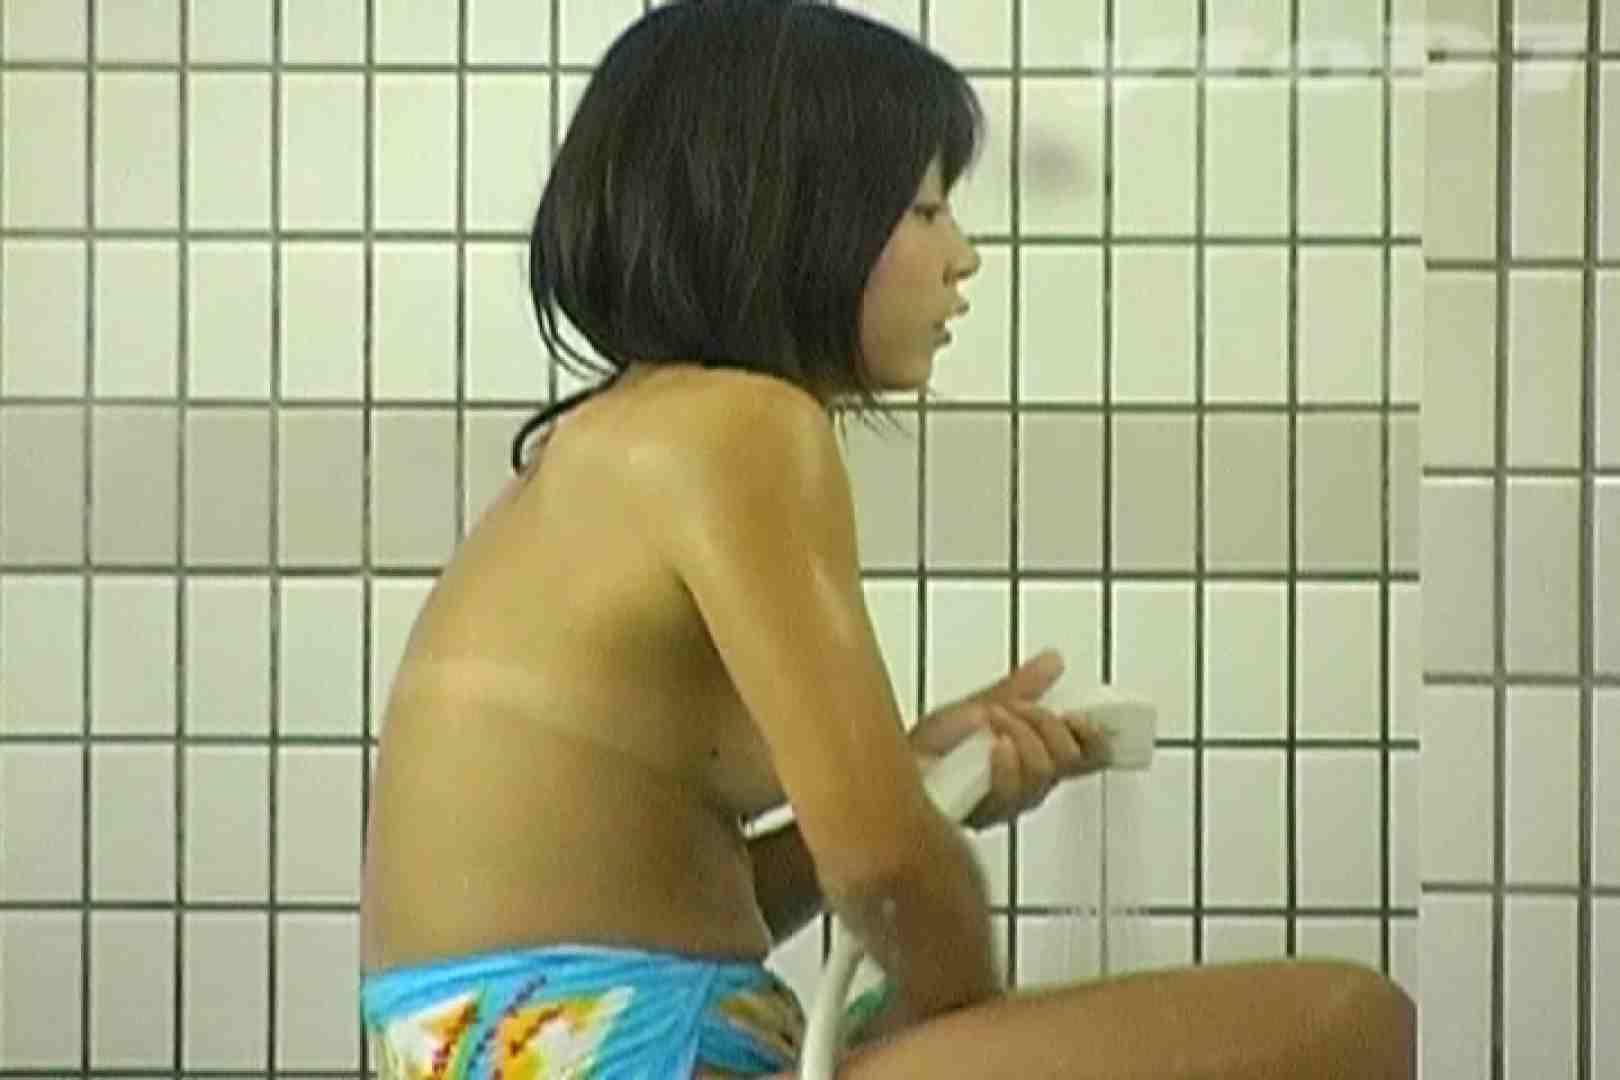 ▲復活限定▲合宿ホテル女風呂盗撮 Vol.01 入浴中 盗撮 85画像 50